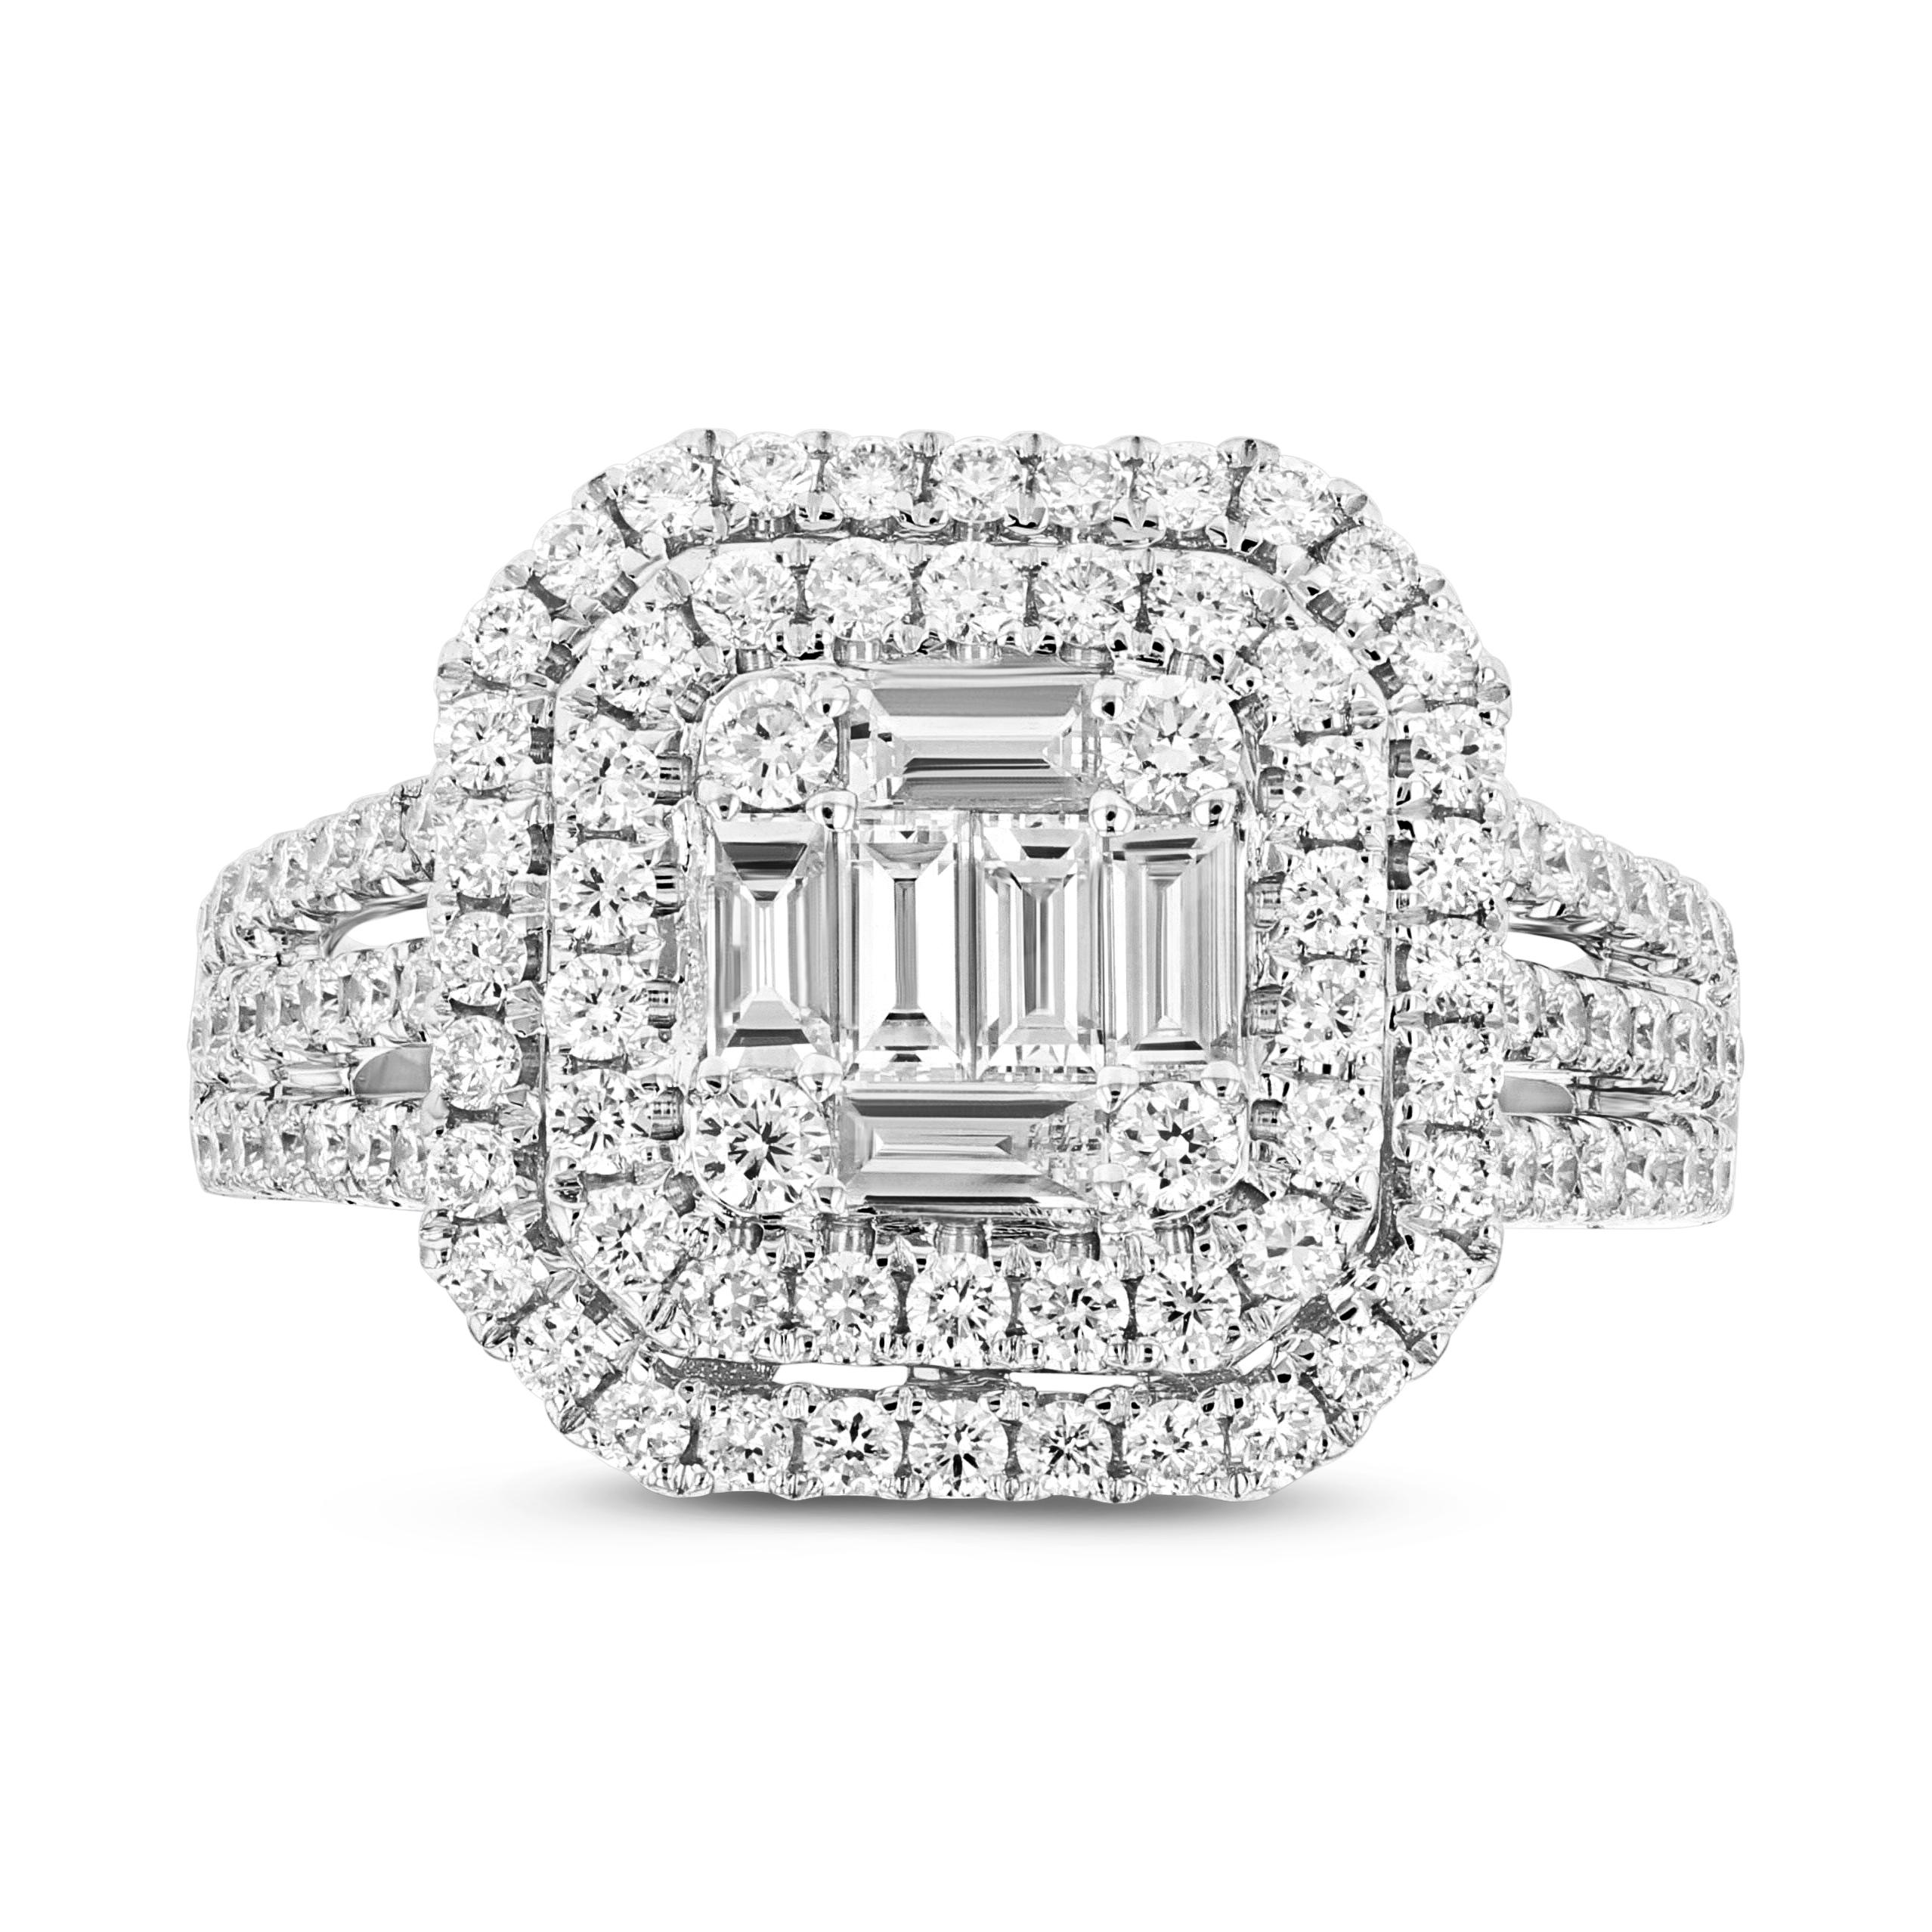 View 1.65ctw Diamond Fashion Ring in 18k White Gold